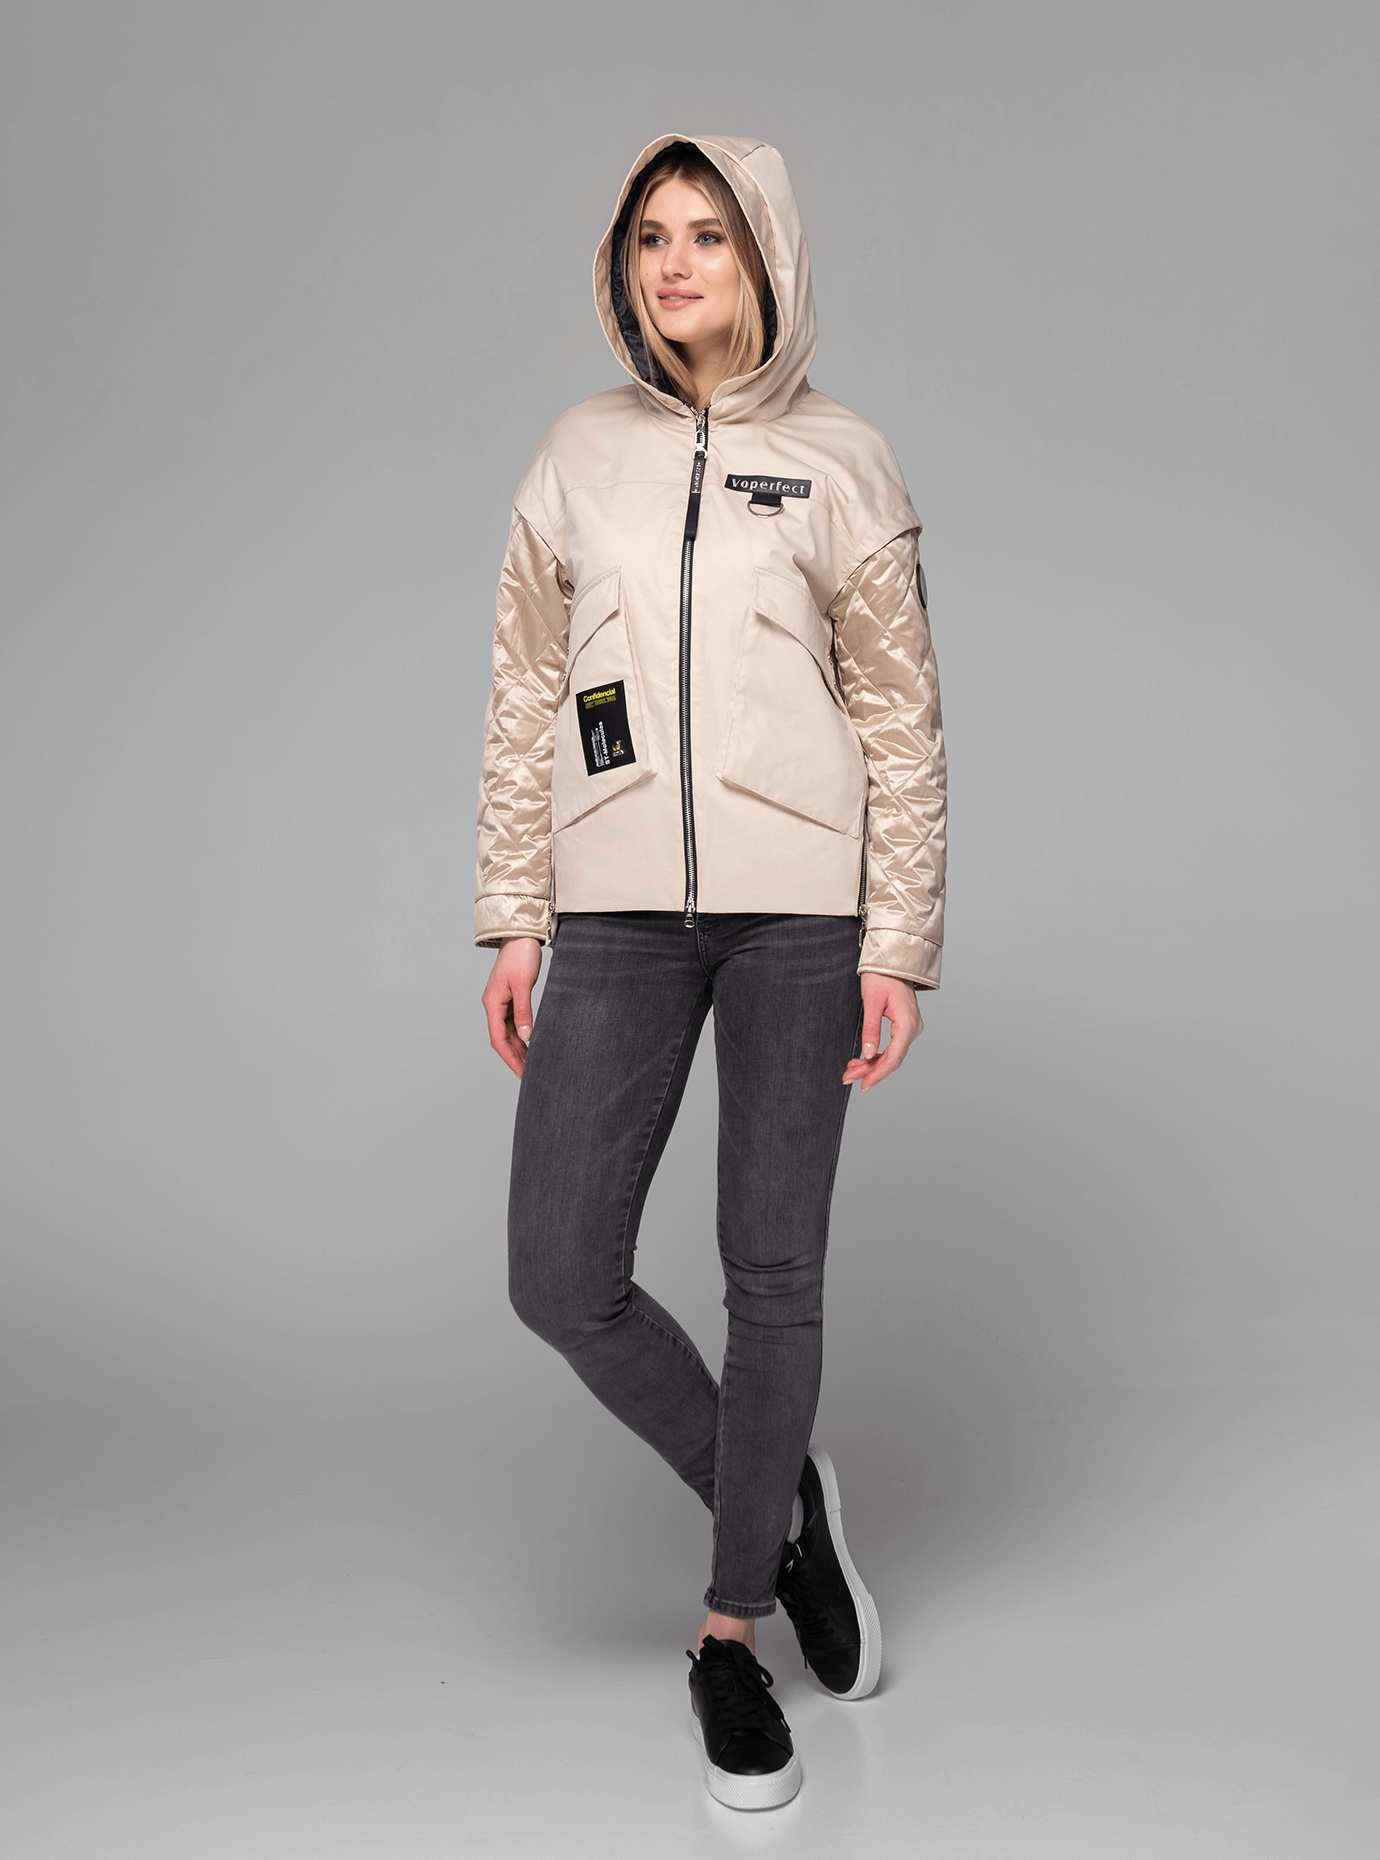 Куртка демисезонная короткая на молнии Бежевый M (02-V191051): фото - Alster.ua